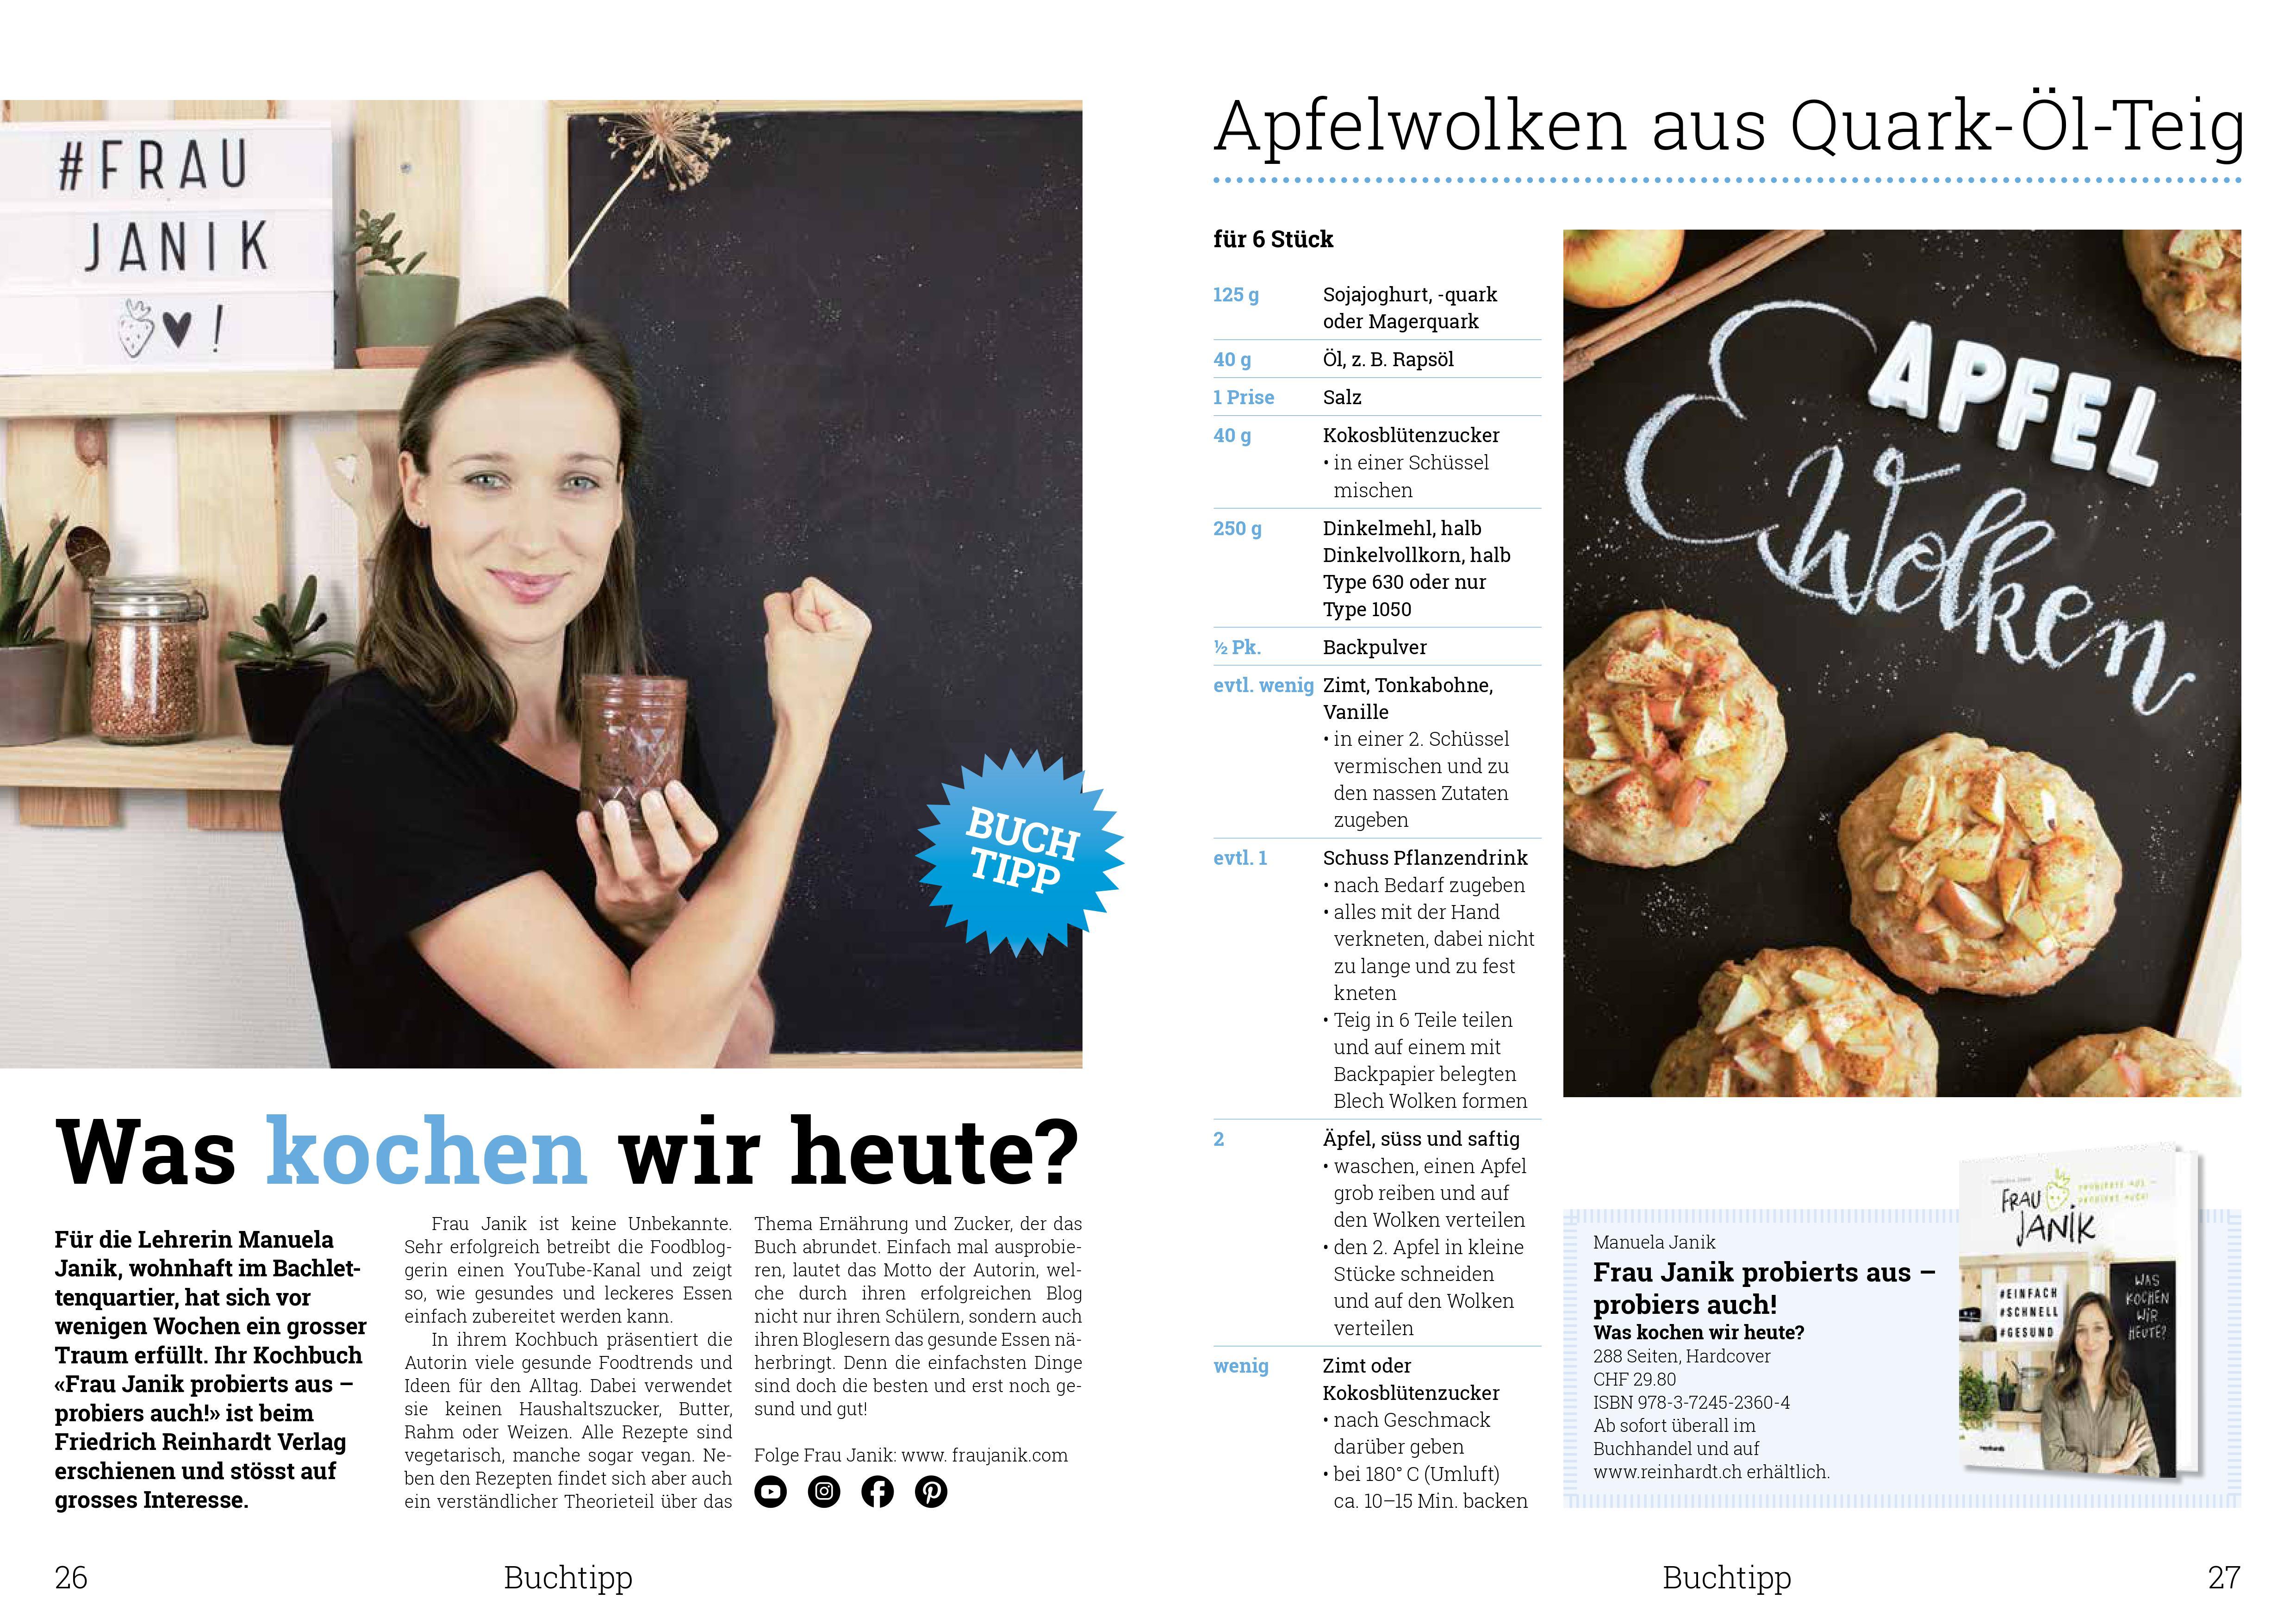 Neubad Magazin, basel, frau janik, reinhardt Verlag